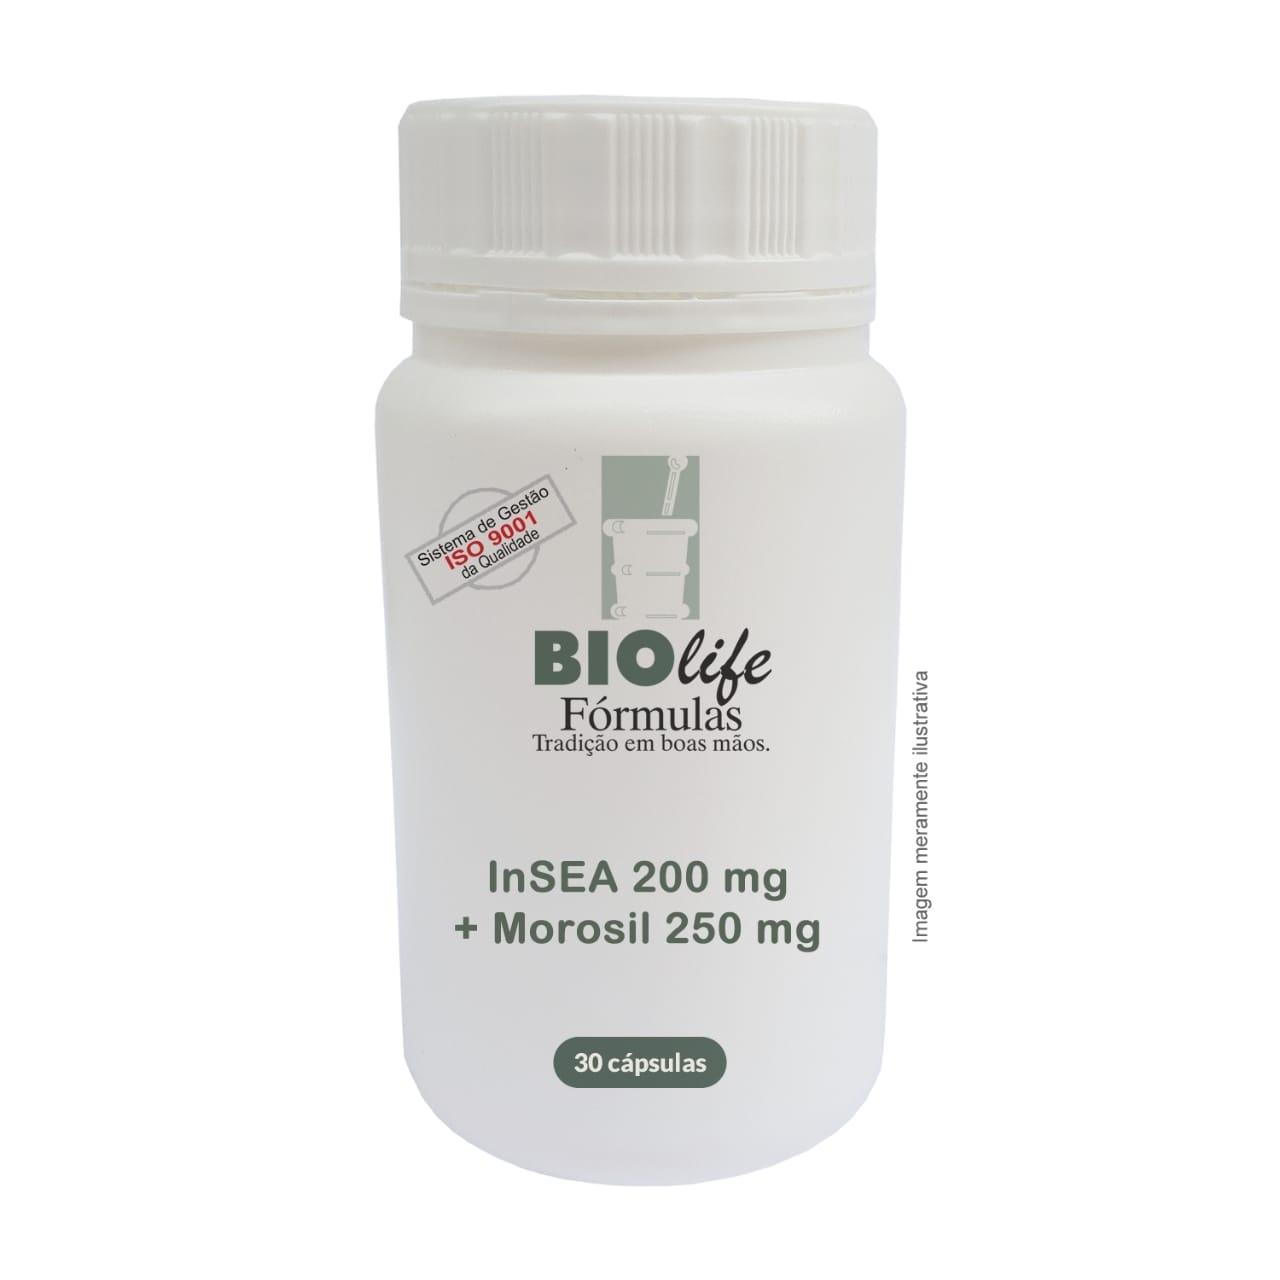 InSEA 200mg + MOROSIL 250mg com 30 cápsulas